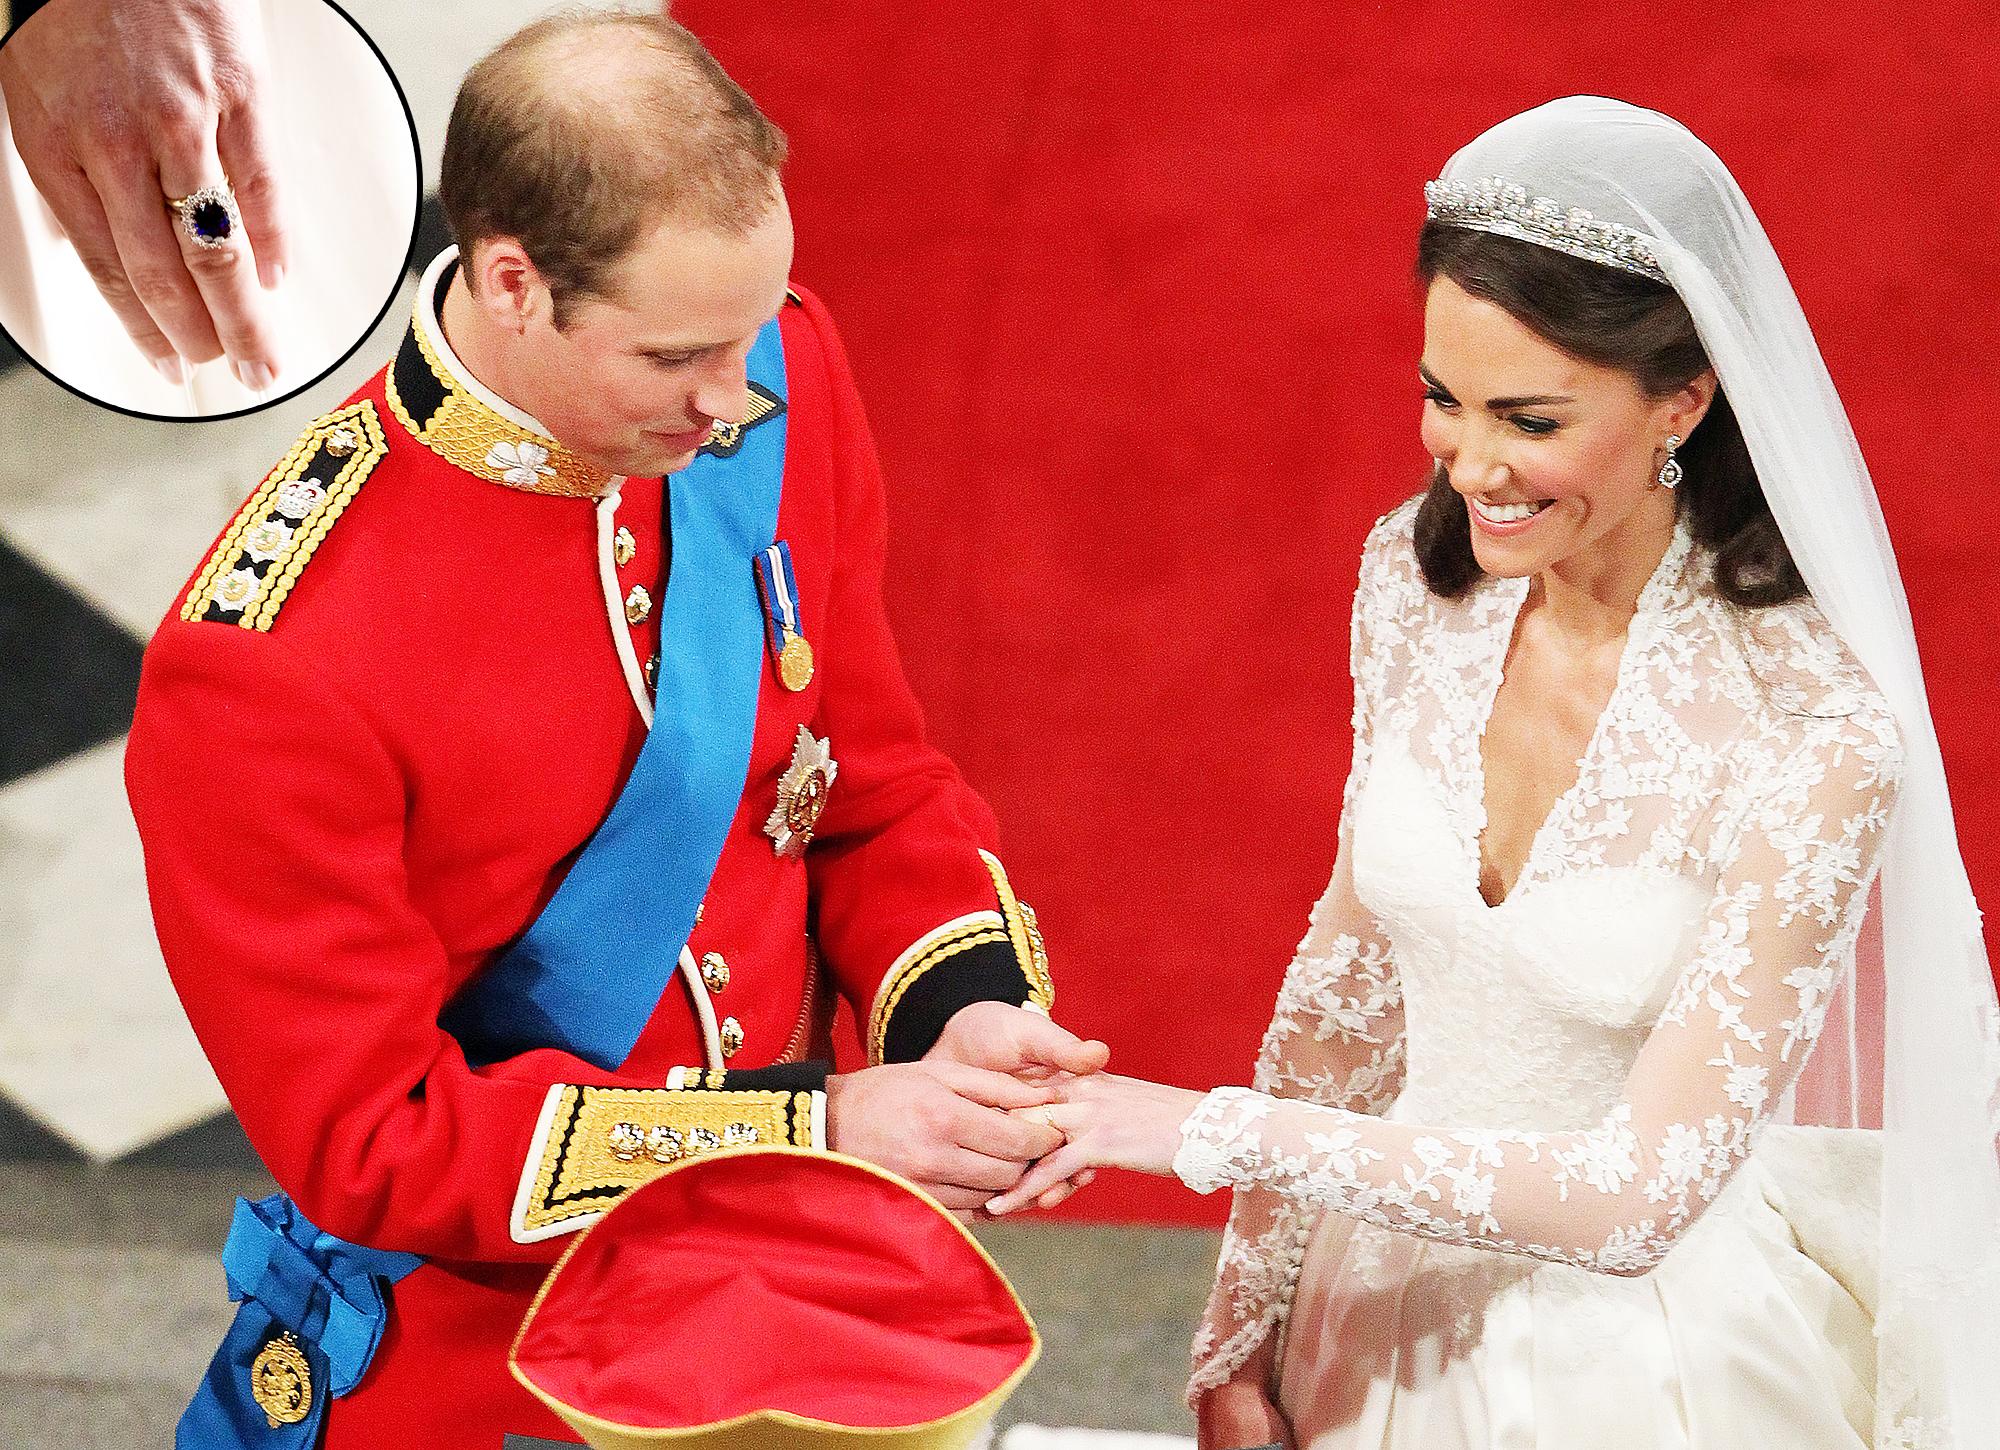 Royal wedding april 2018 photos Royal Wedding 2018: Everything You Need To Know